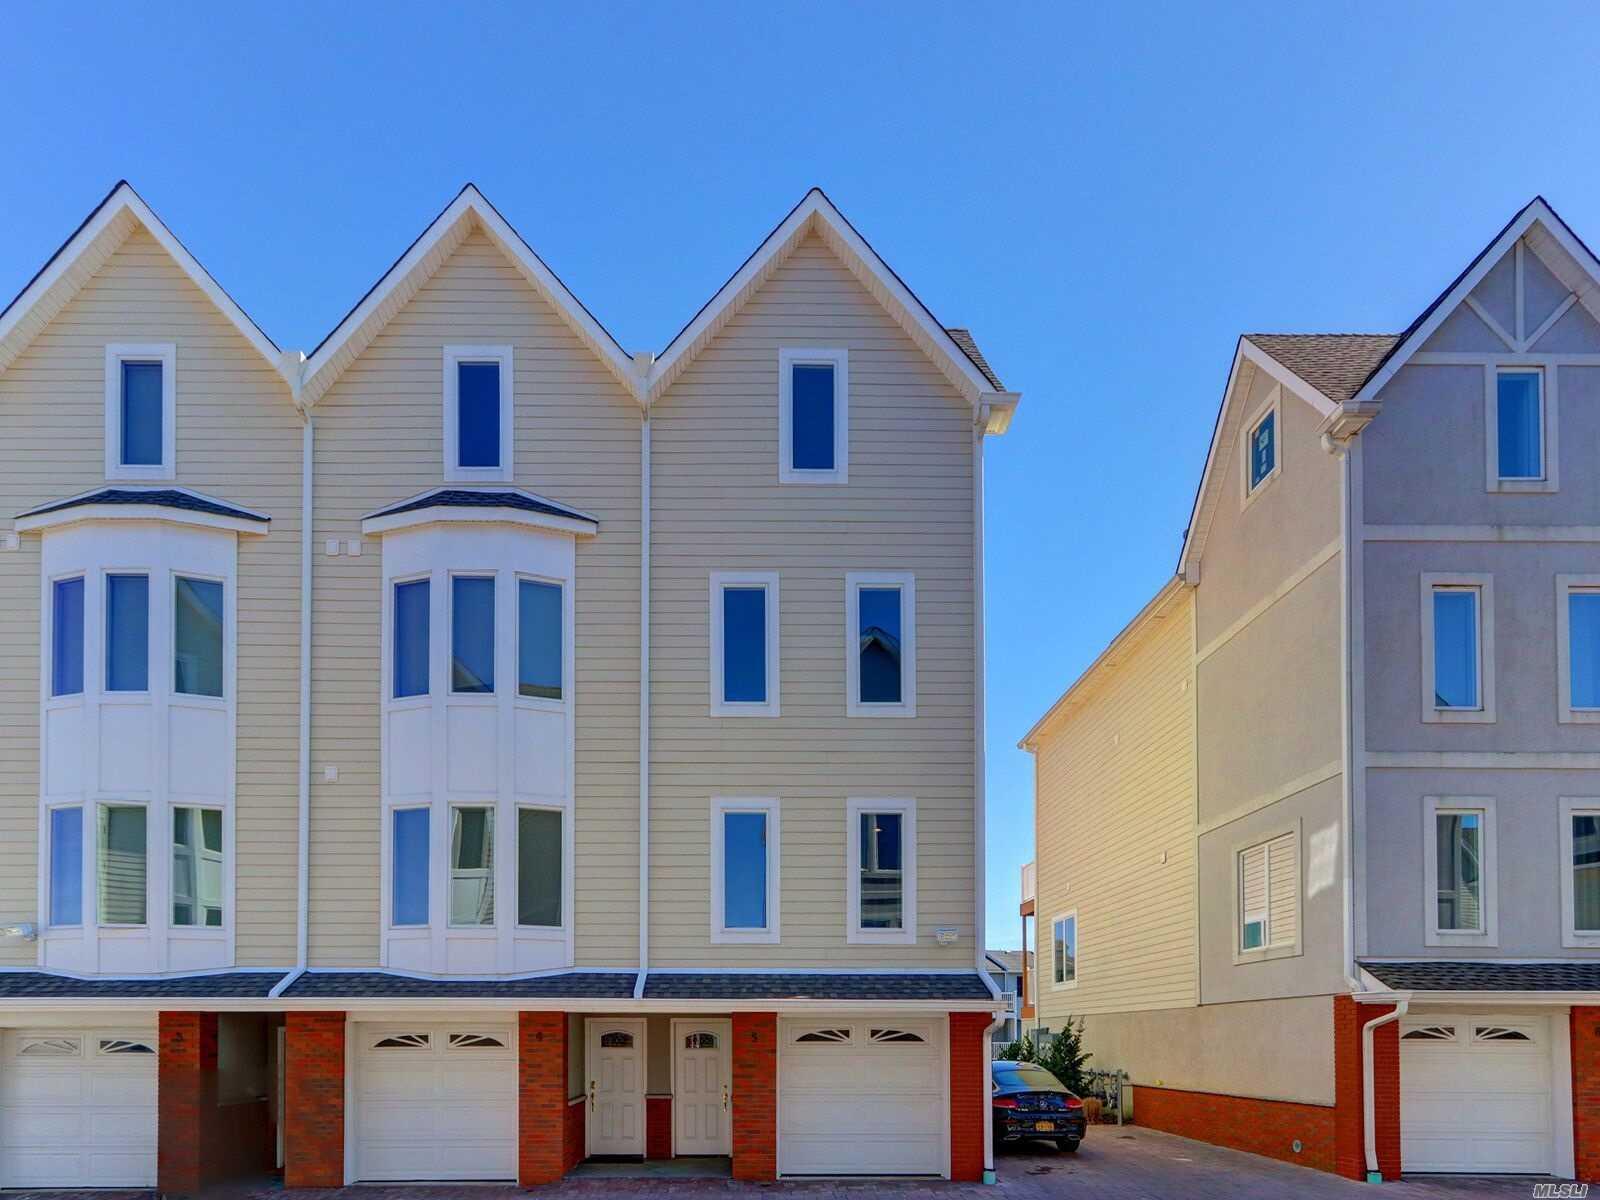 Property for sale at 531 Ray Street # 5, Freeport NY 11520, Freeport,  New York 11520